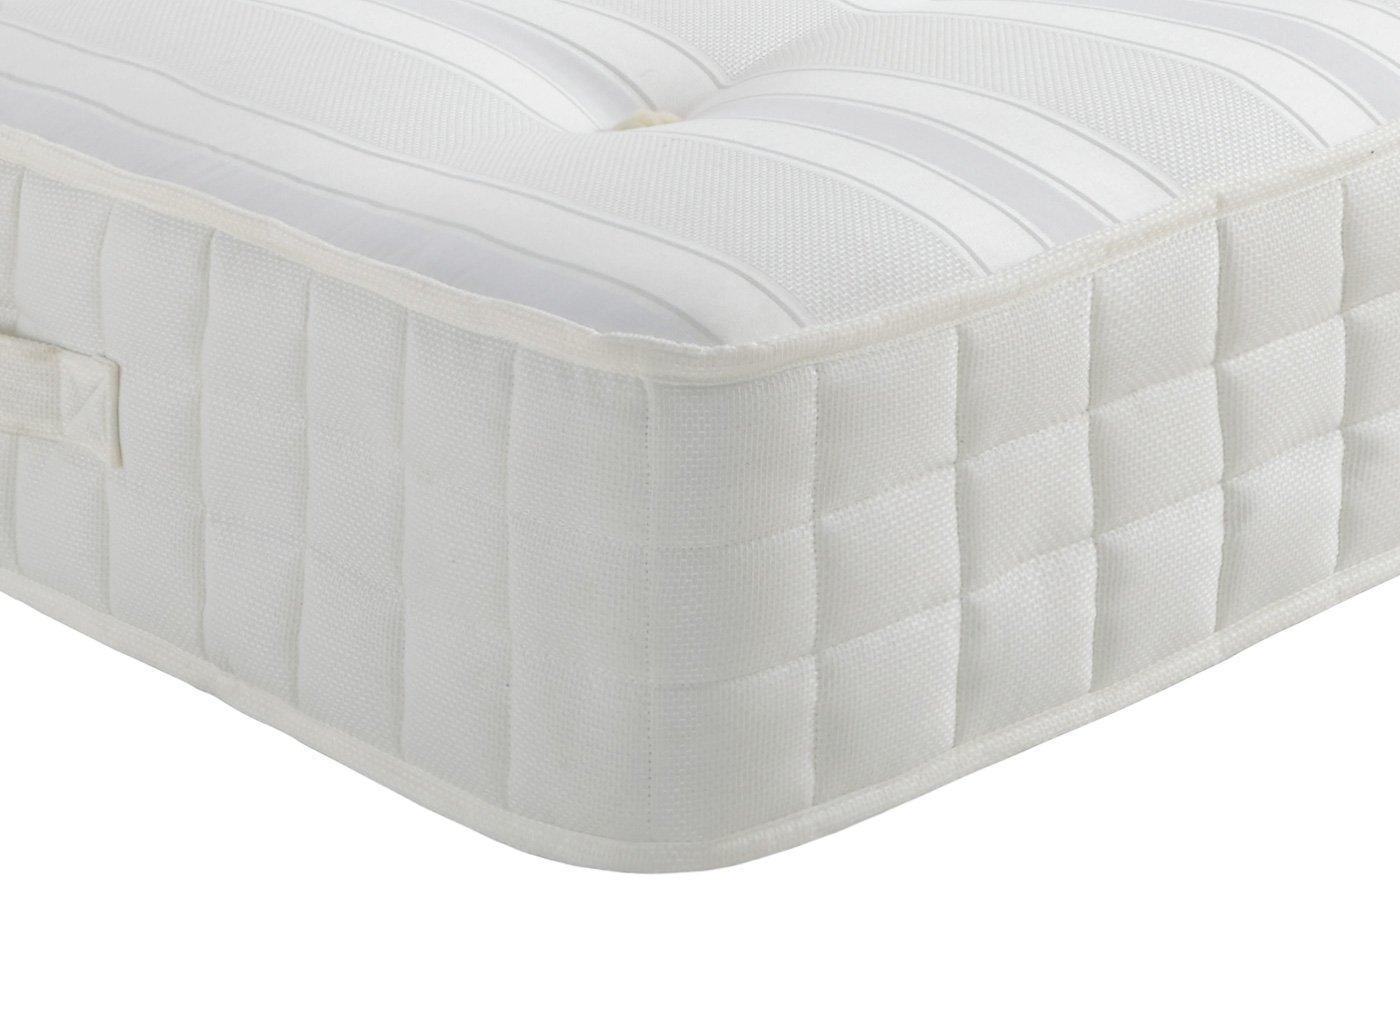 insignia-burnham-pocket-sprung-mattress